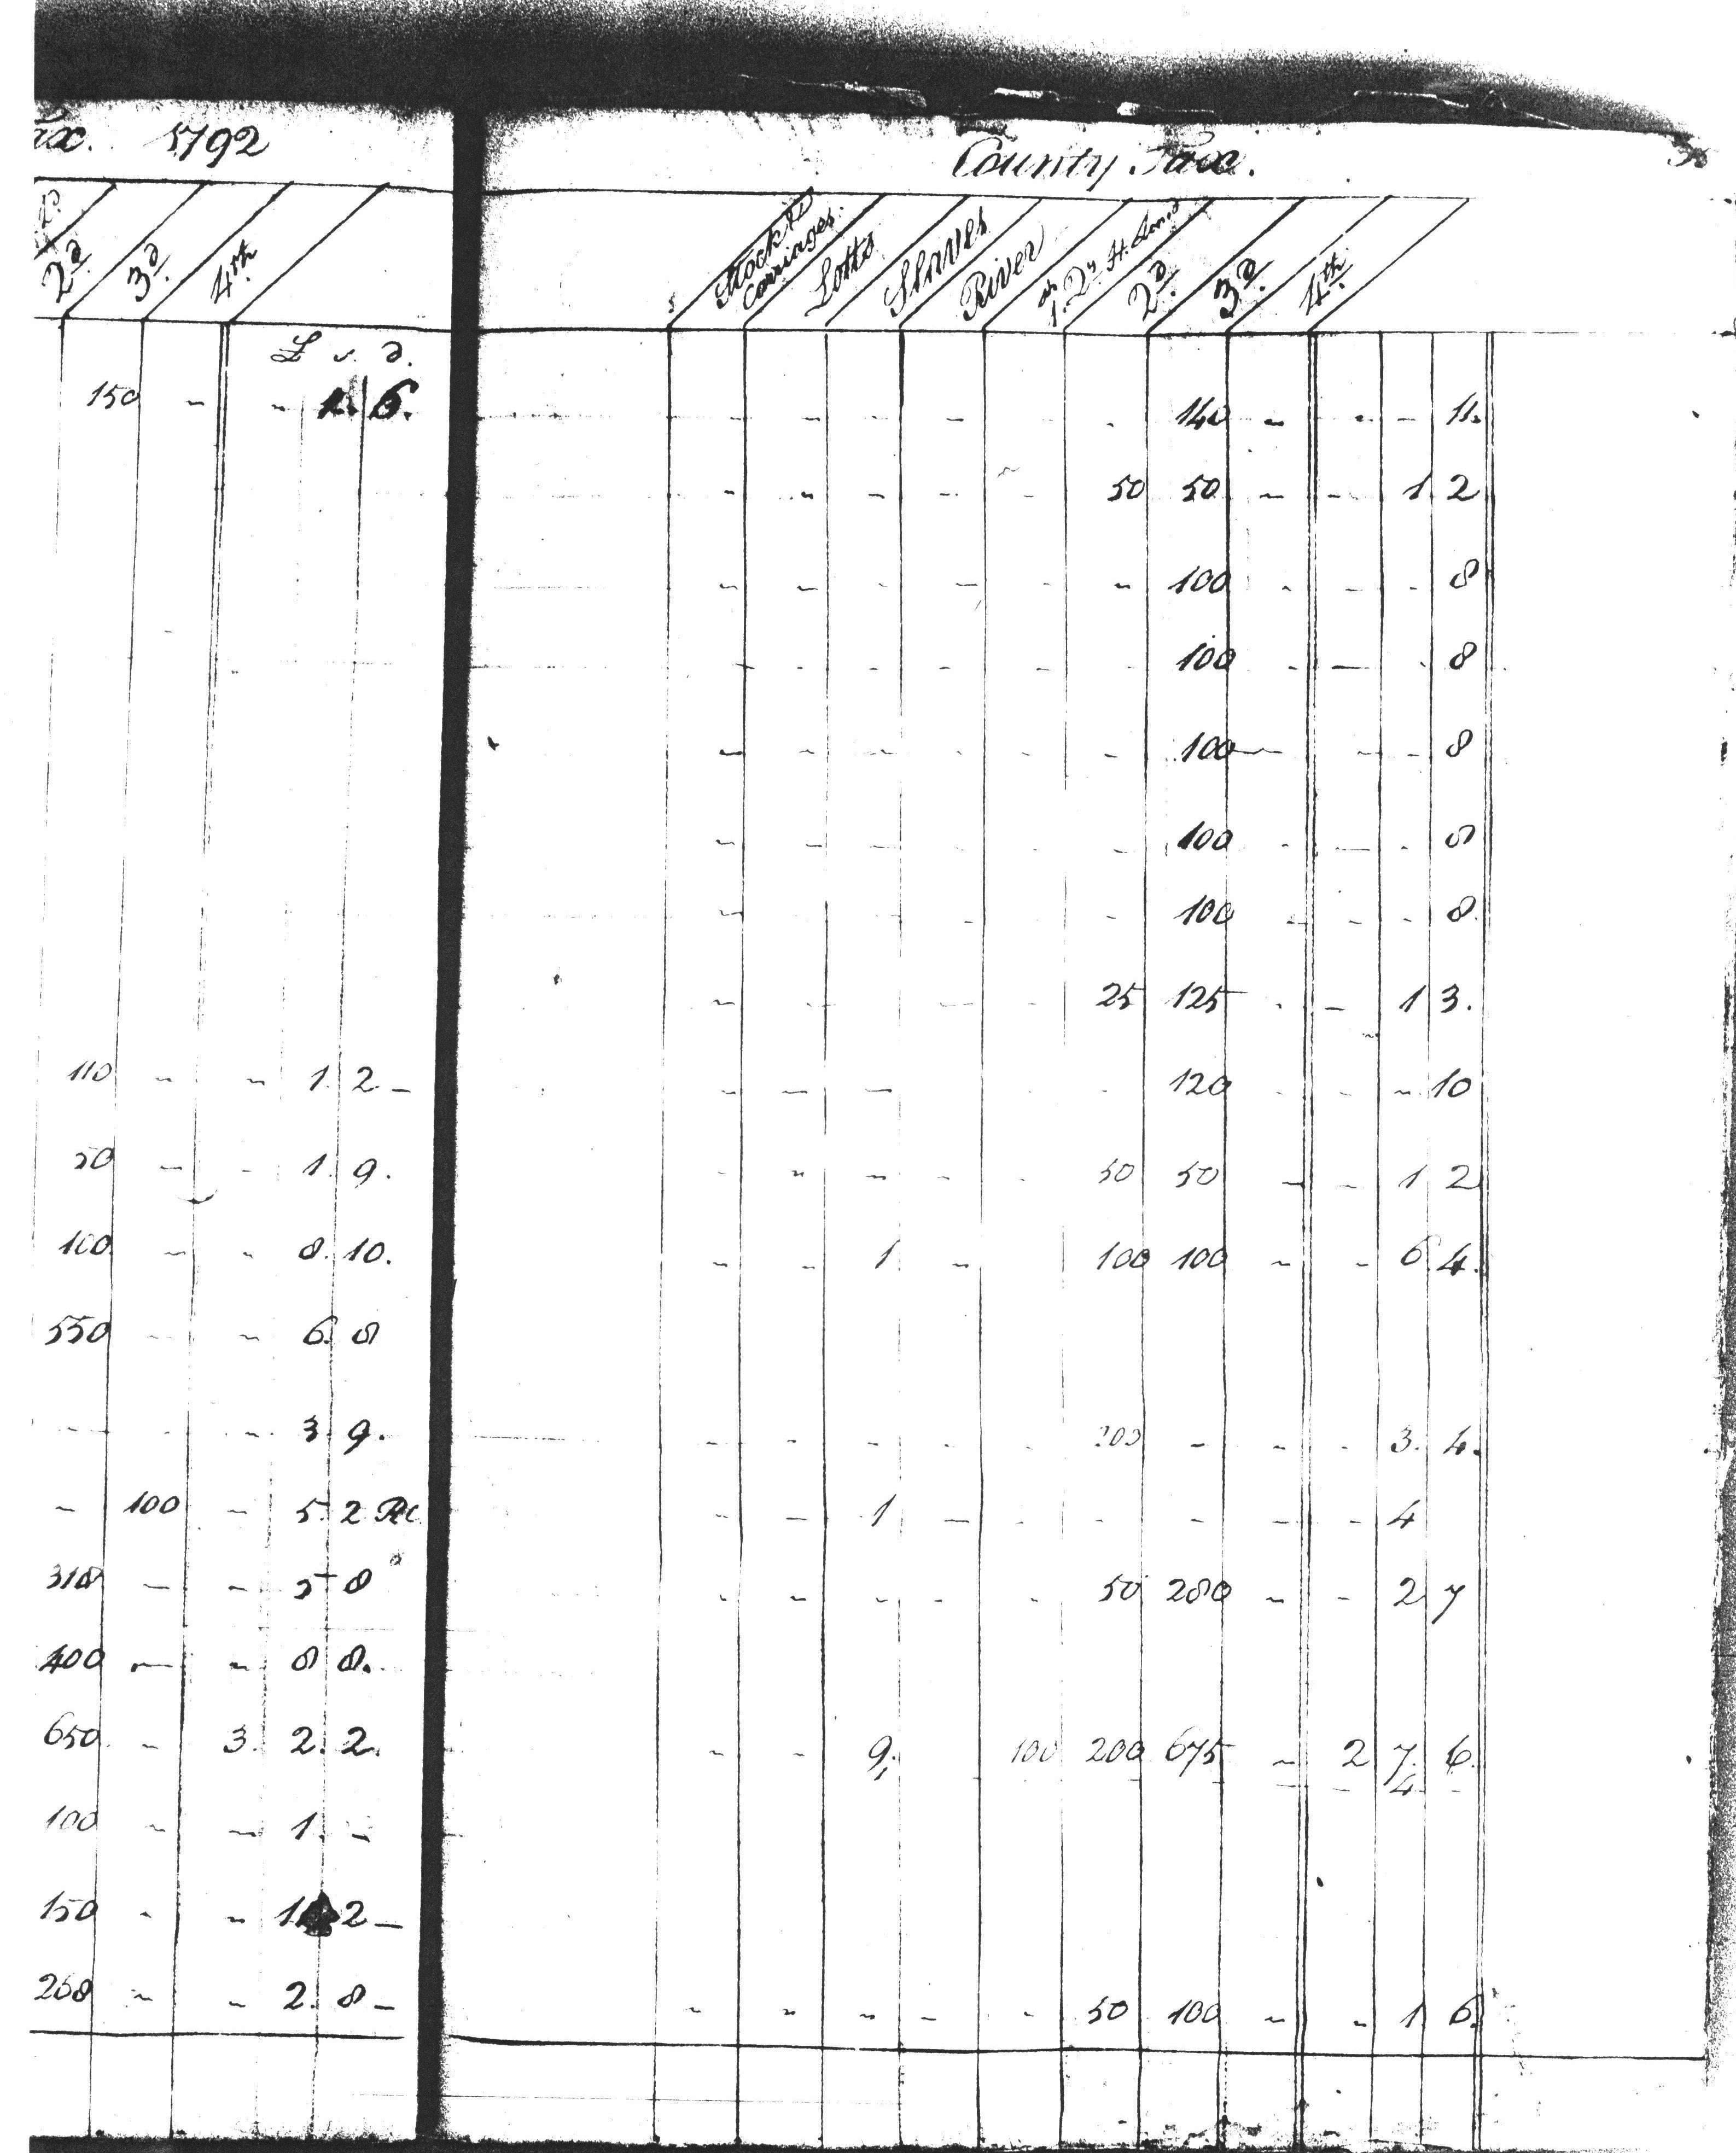 1839 SC MAP Orangeburg Pickens County Old South Carolina History      HUGE